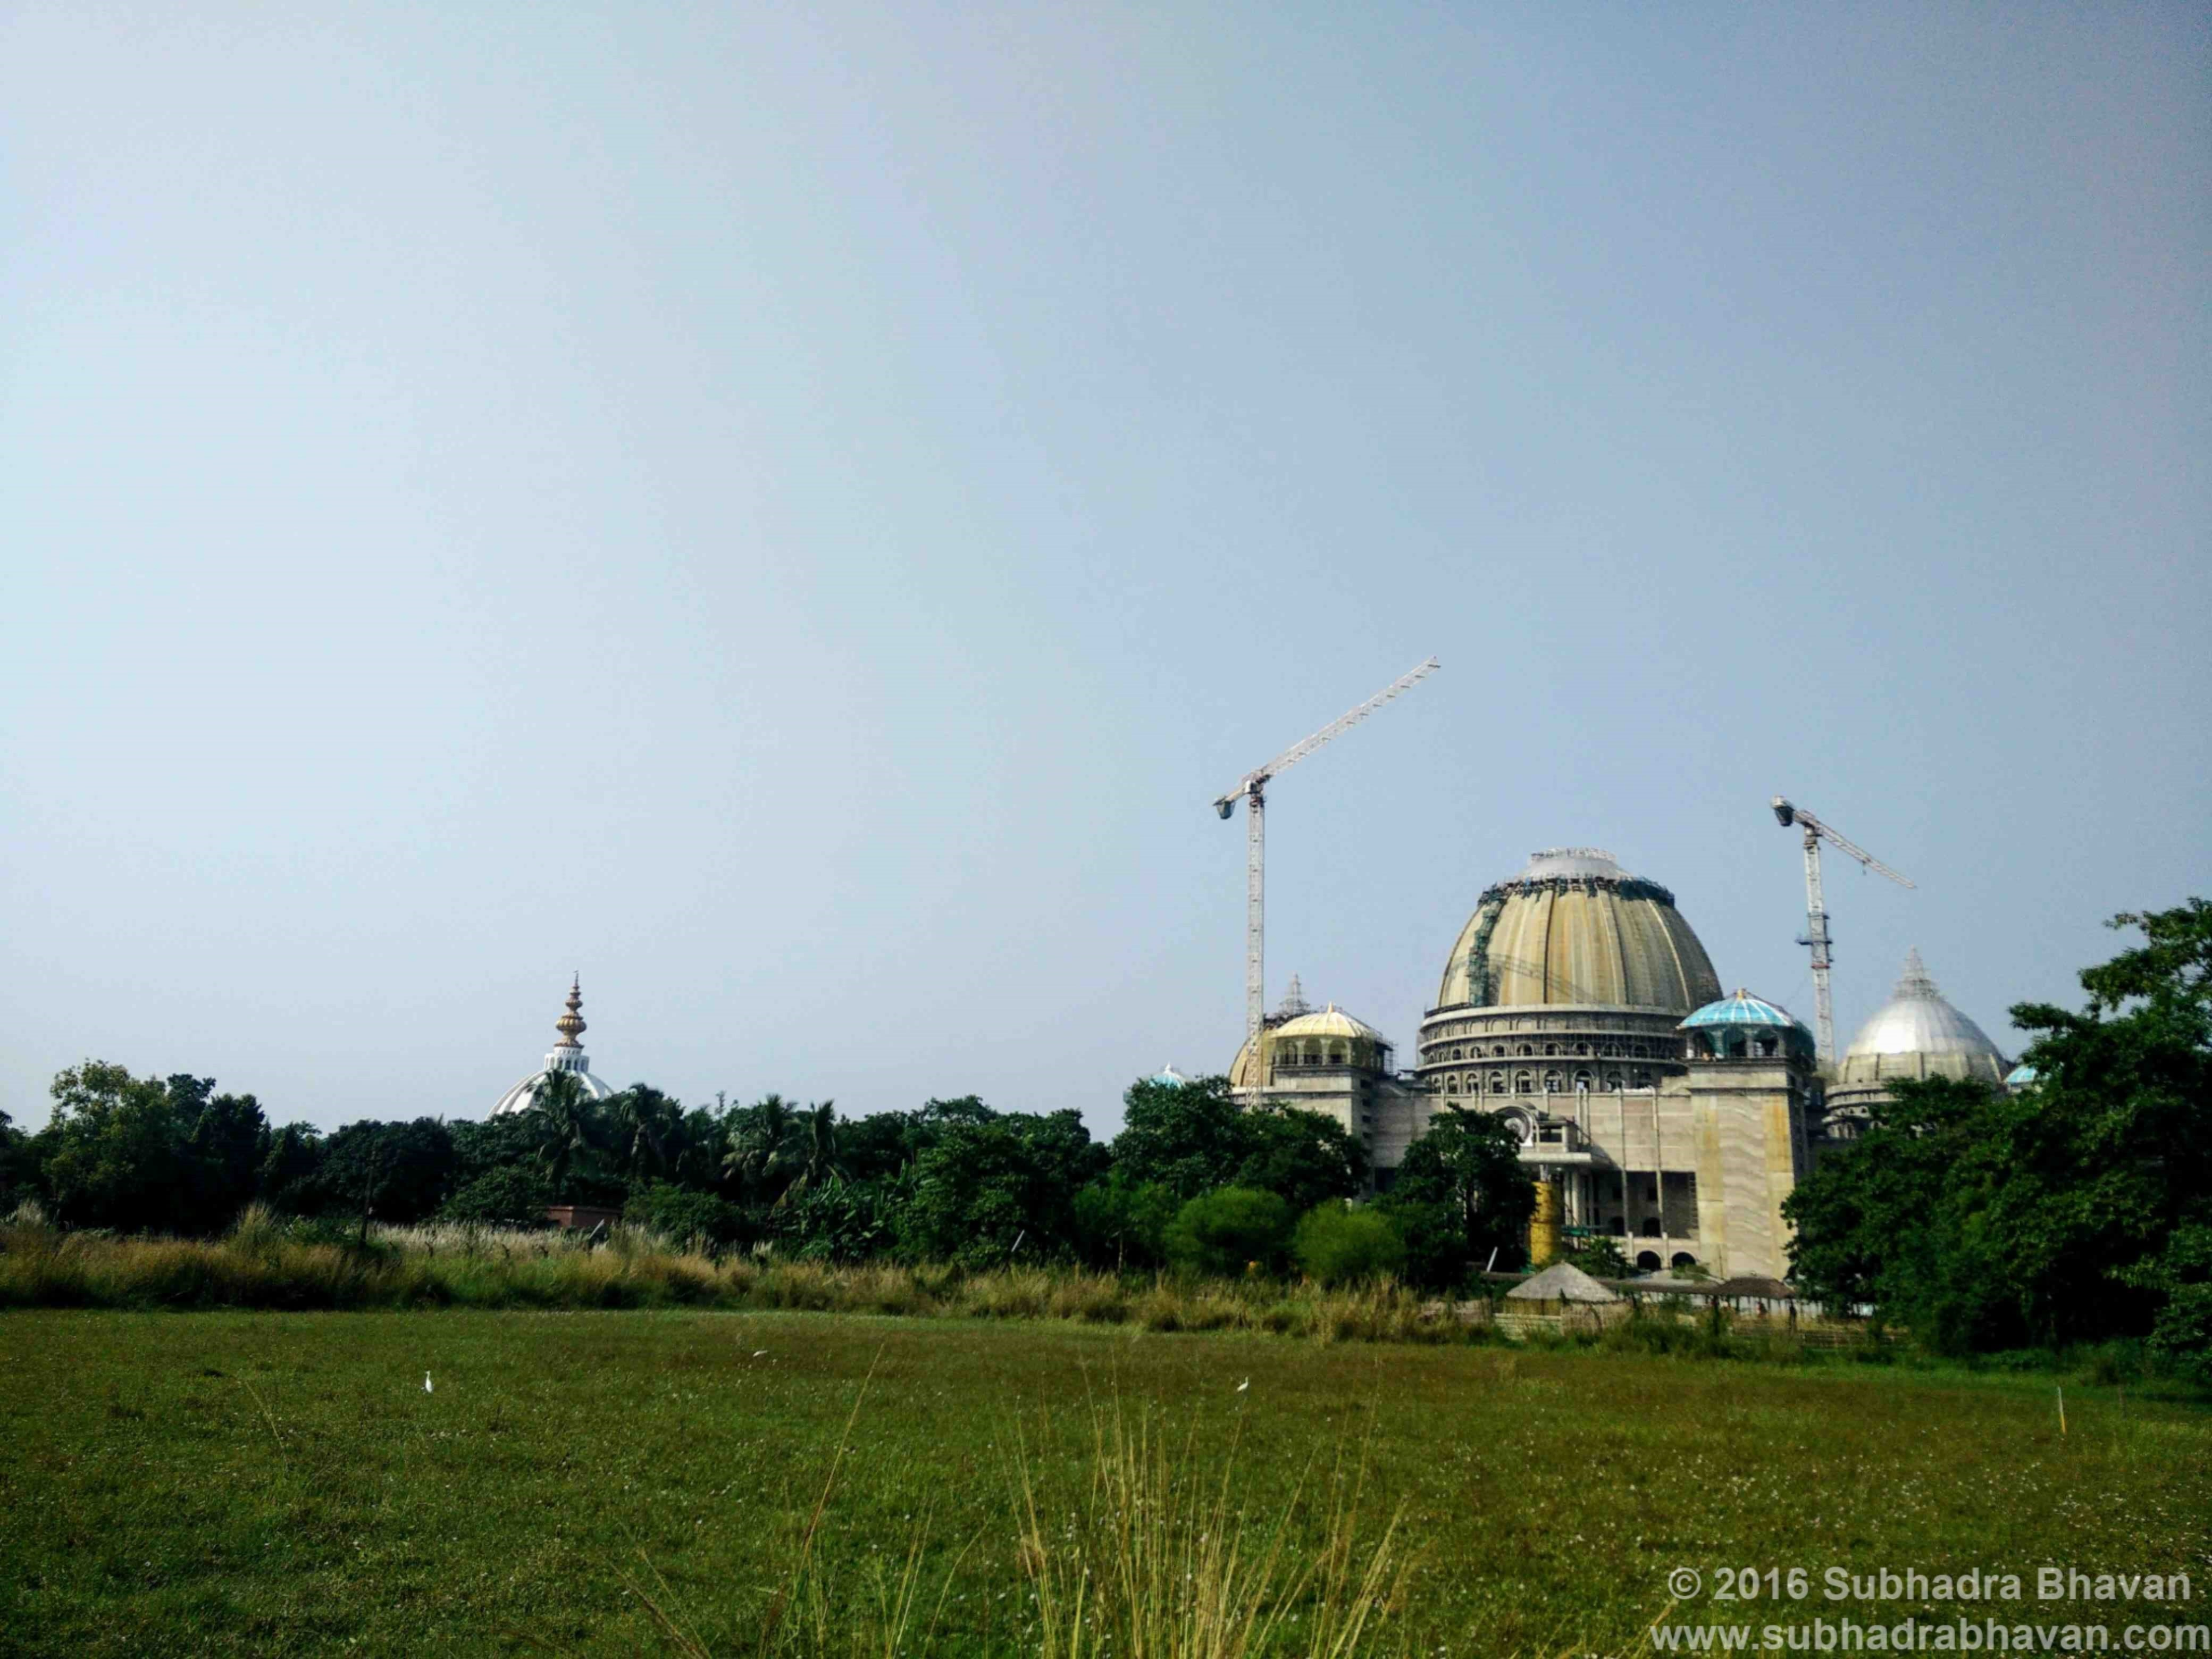 How to reach ISKCON Mayapur - Spiritual Capital of the World